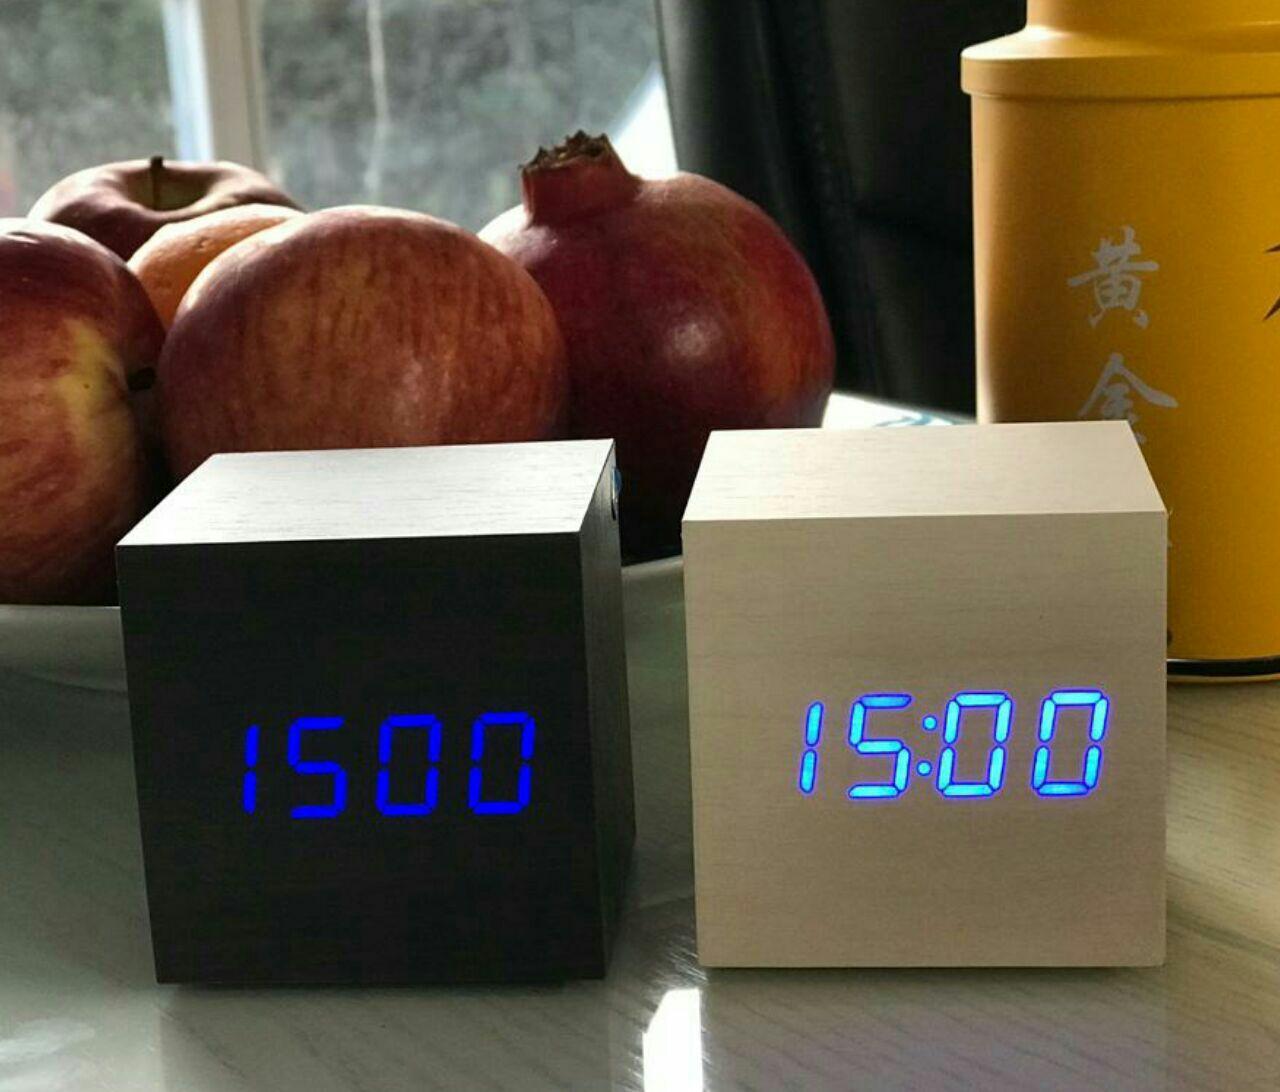 ساعت و دماسنج LED رومیزی مکعب